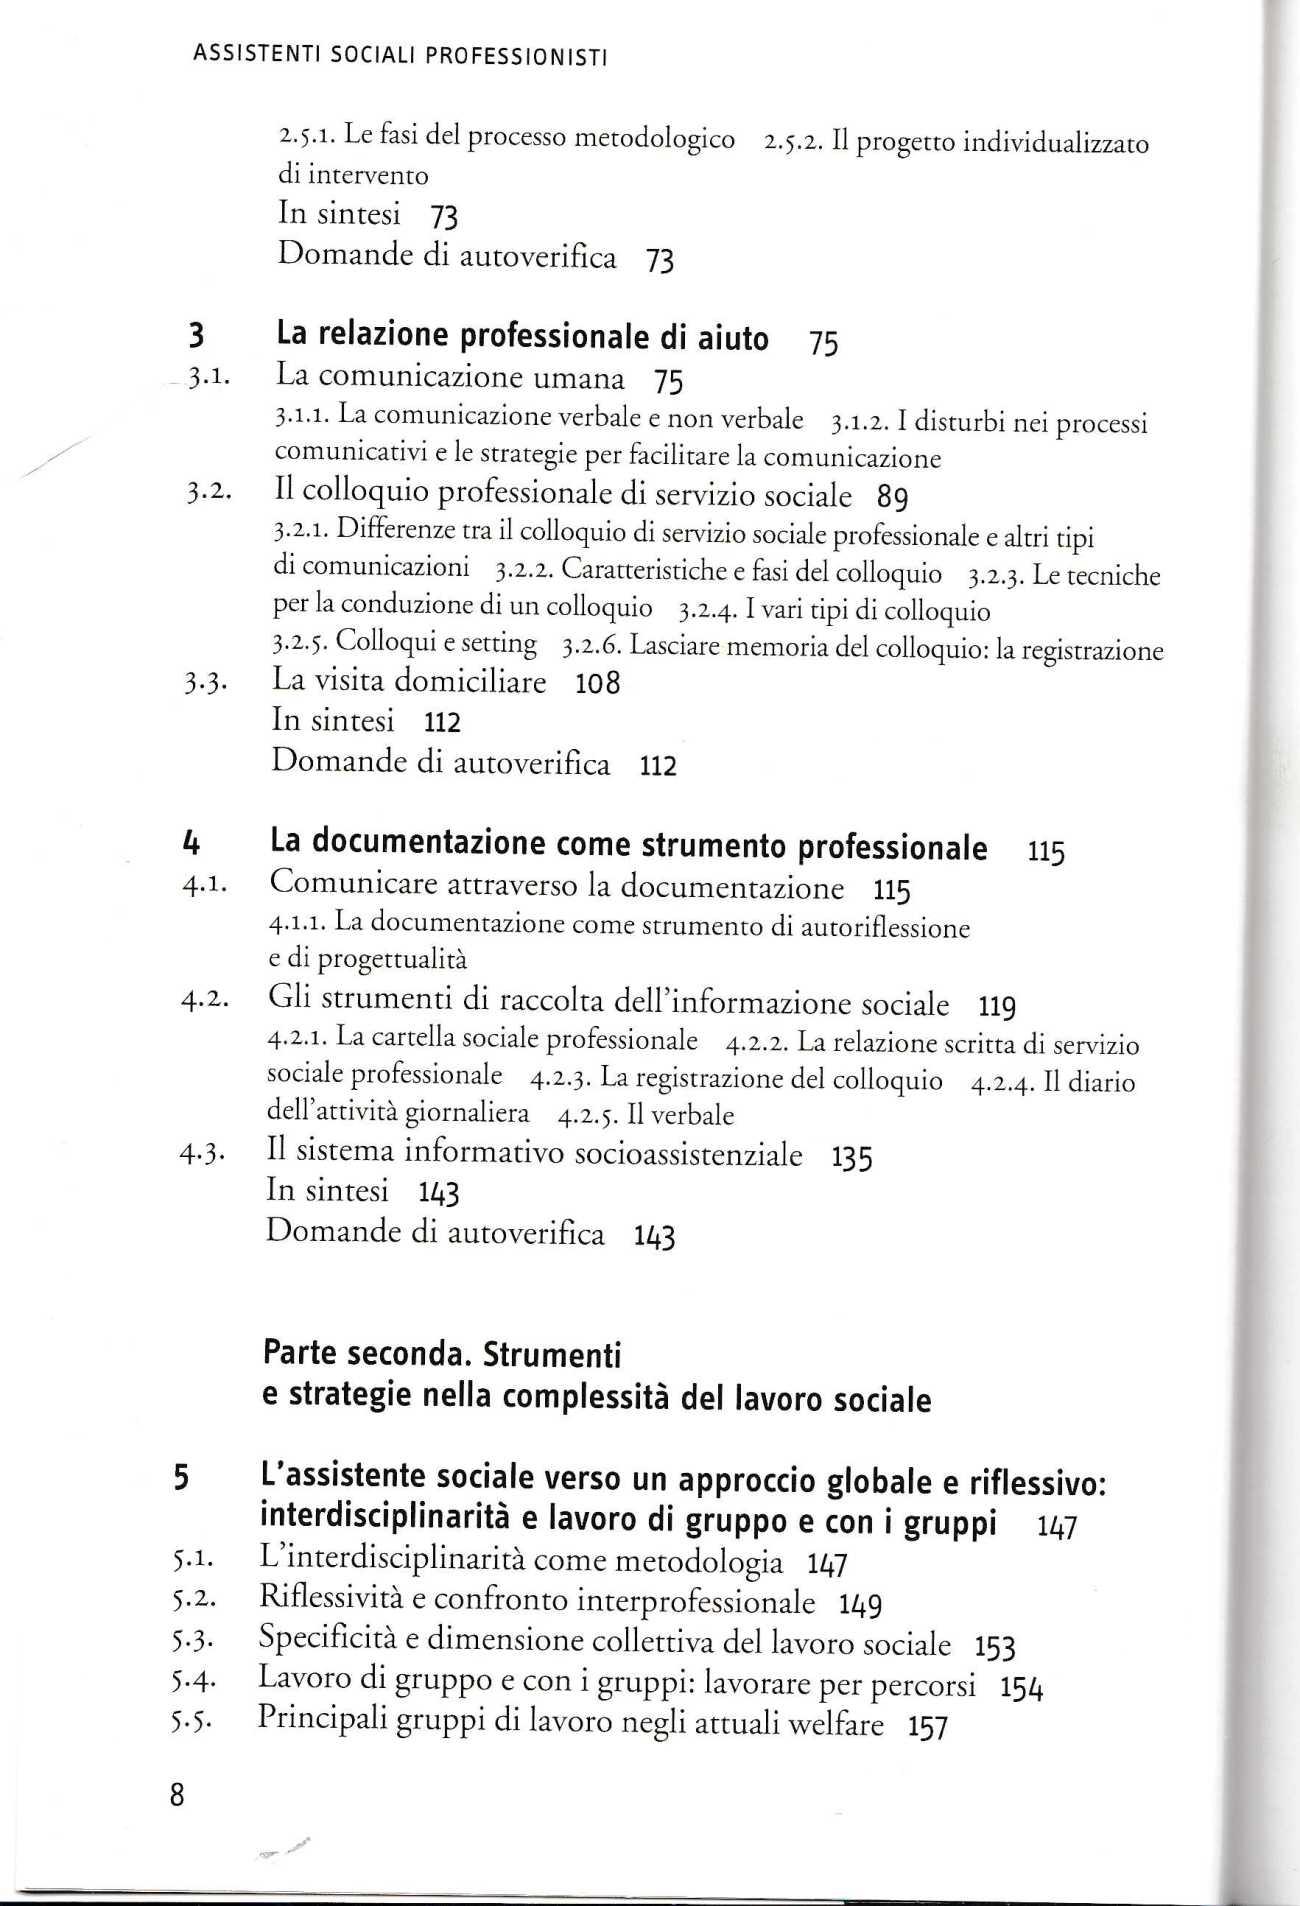 ZILIANTI ROVAI2156